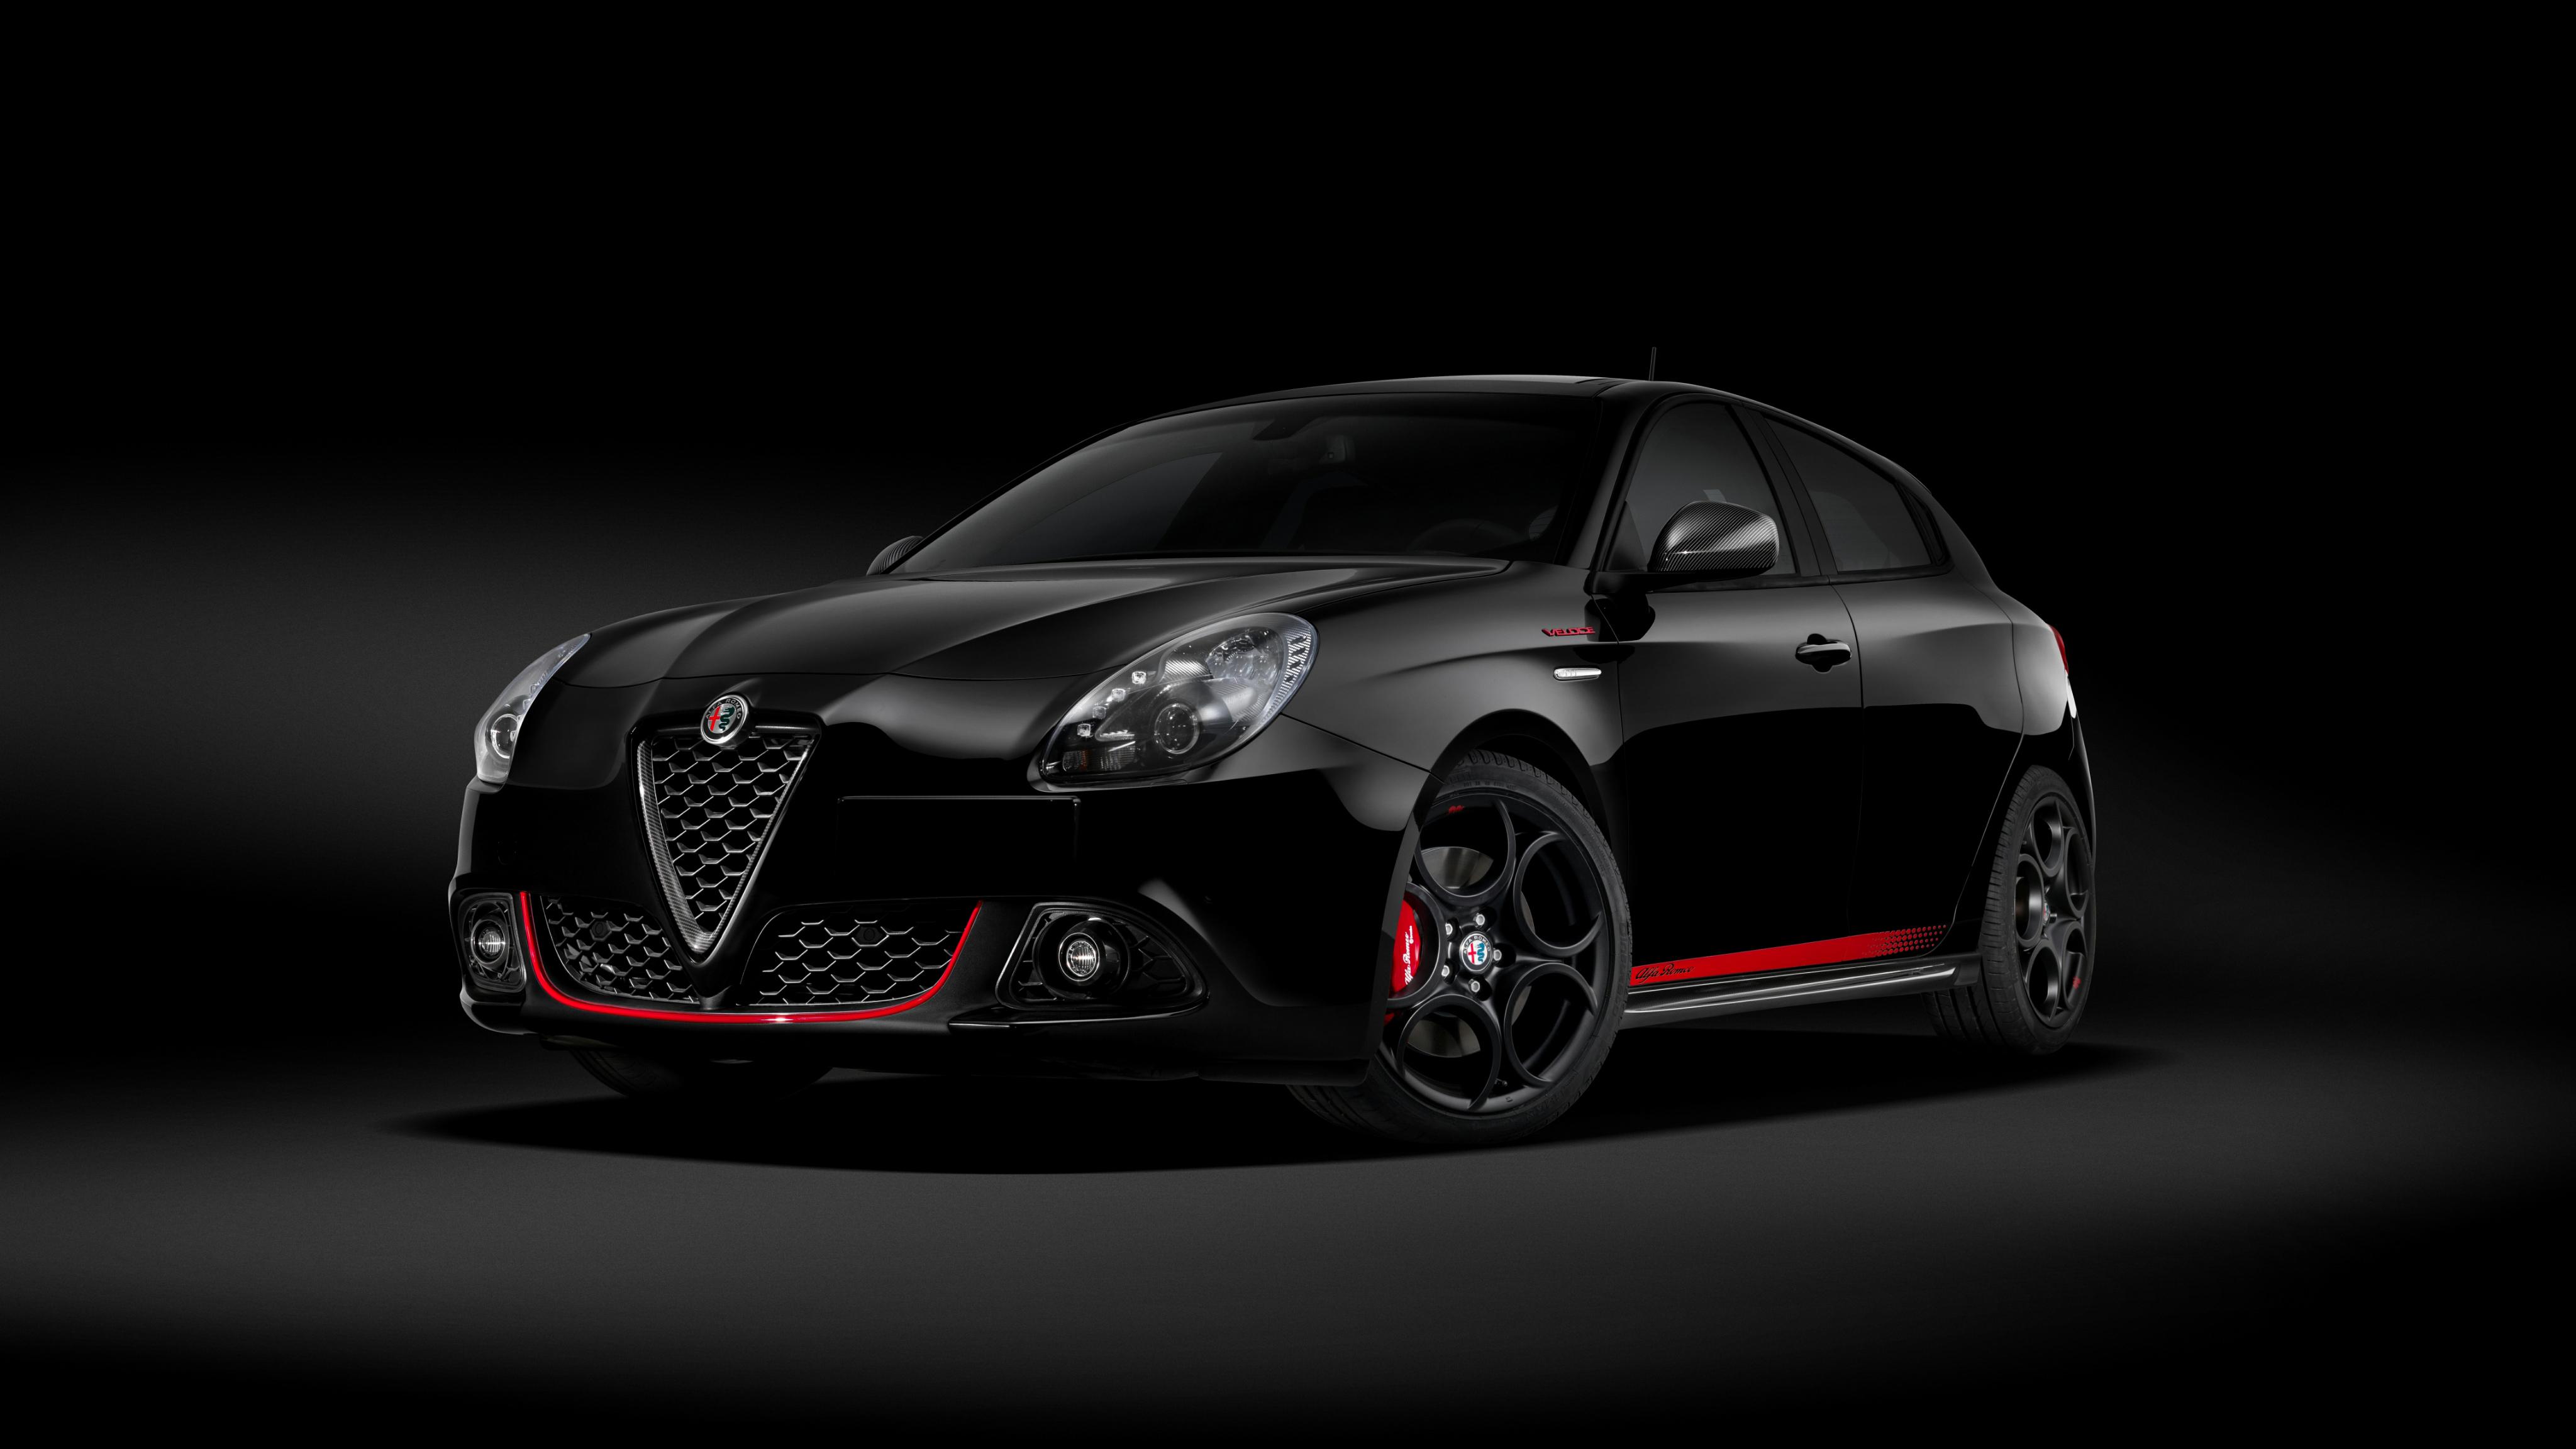 Alfa Romeo Giulietta Wallpapers Wallpaper Cave